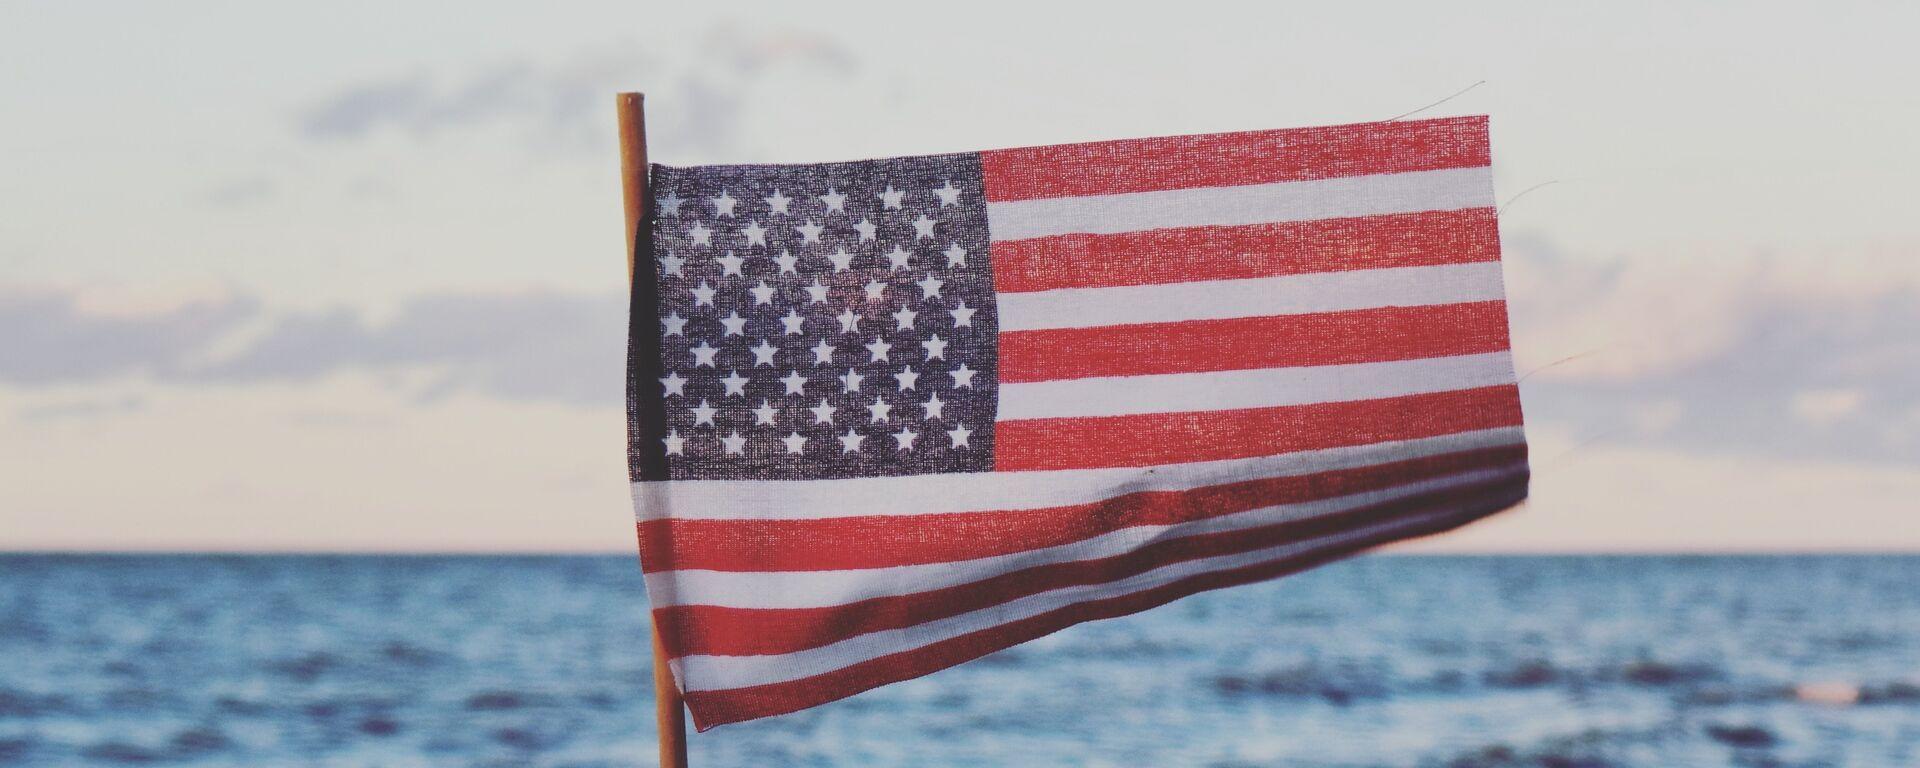 Bandera de EEUU - Sputnik Mundo, 1920, 22.06.2021